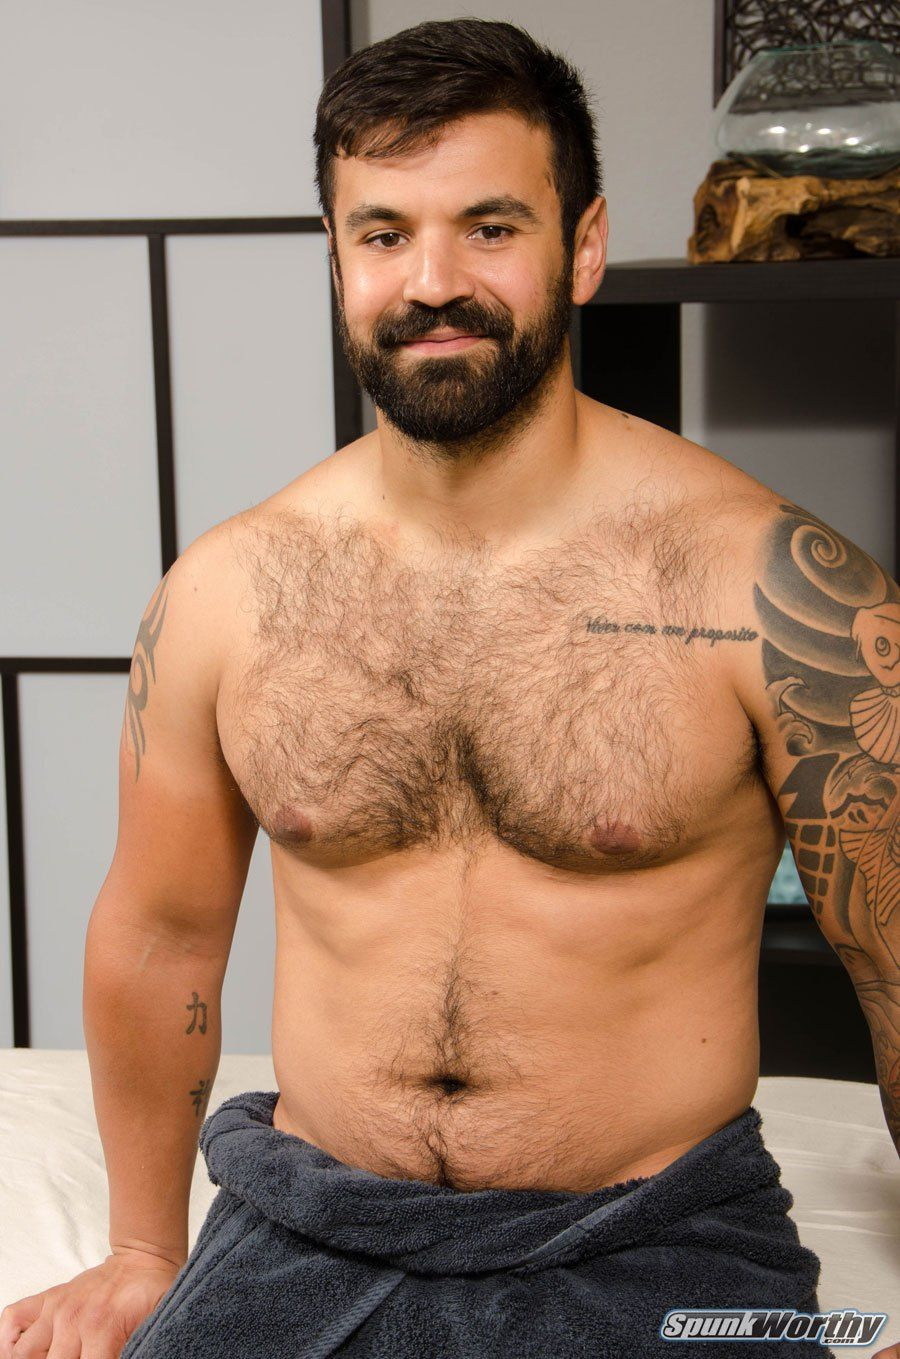 newest 23e2a 5b771 SPUNKWORTHY.COM   faves   Pinterest   Sexy men, Bear cubs y Muscle bear